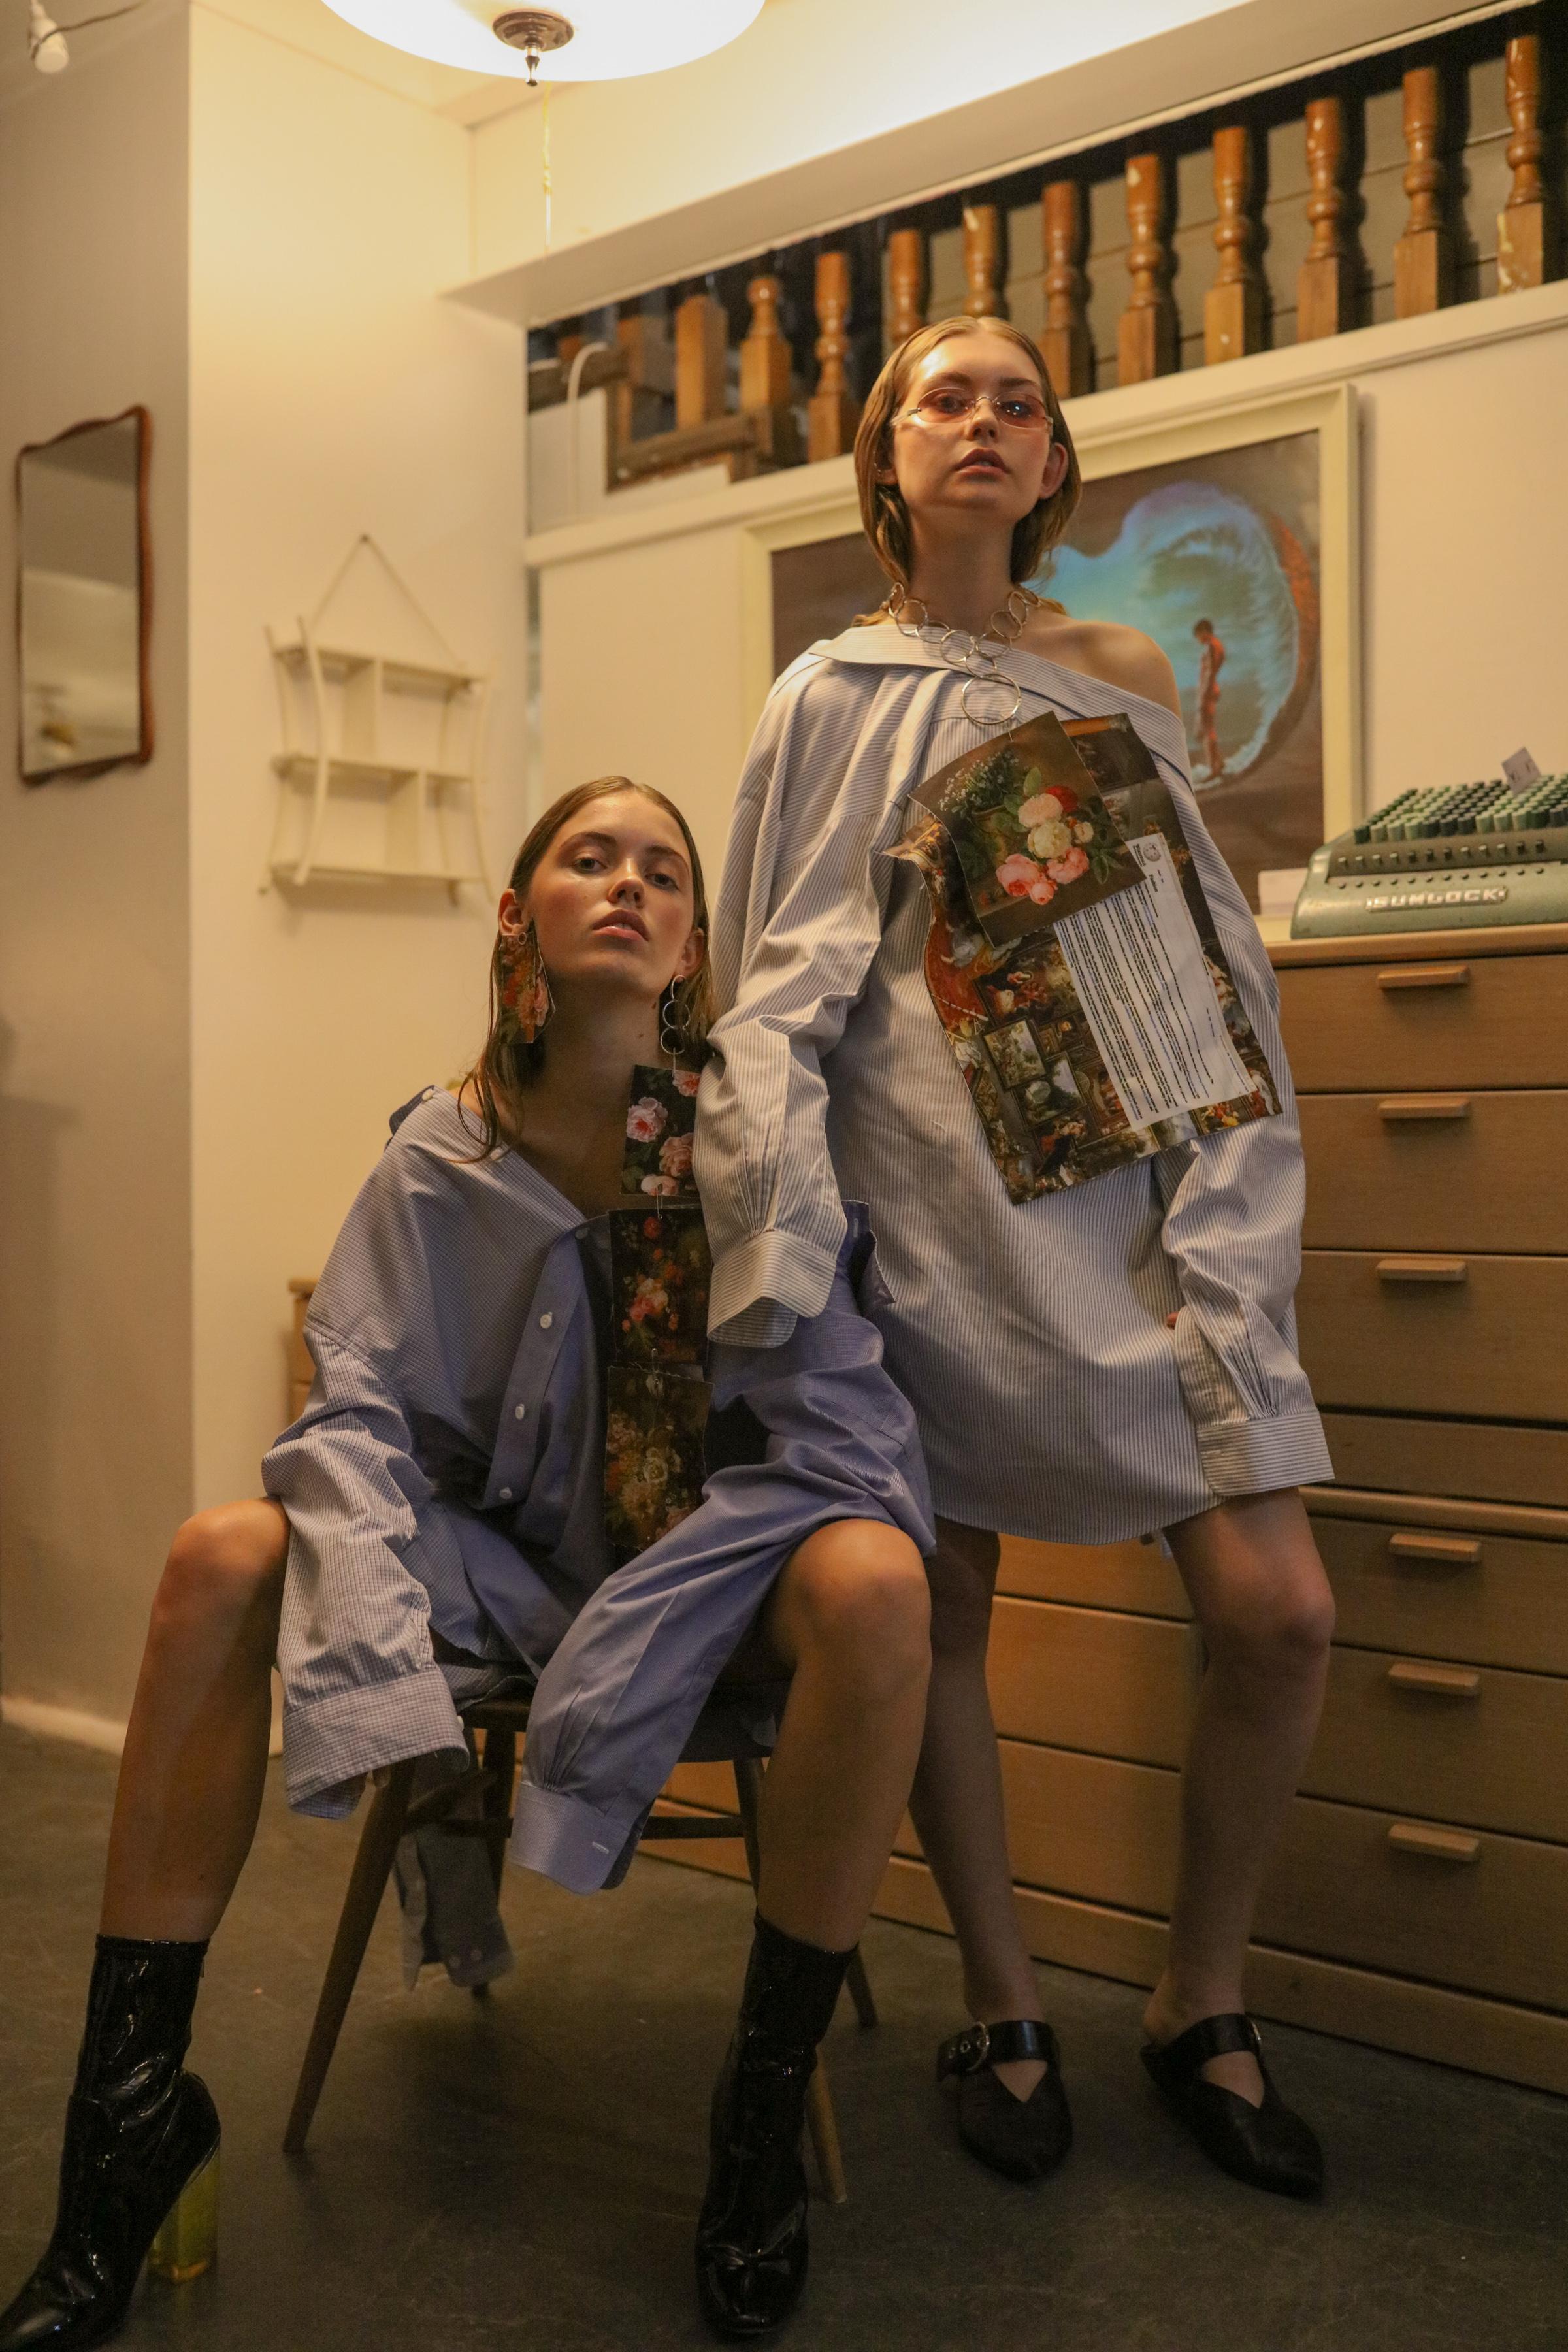 Sarah & Kymberley wear Samantha Diorio & Jake Paraskeva necklace/earring tags, Samantha Diorio shirts